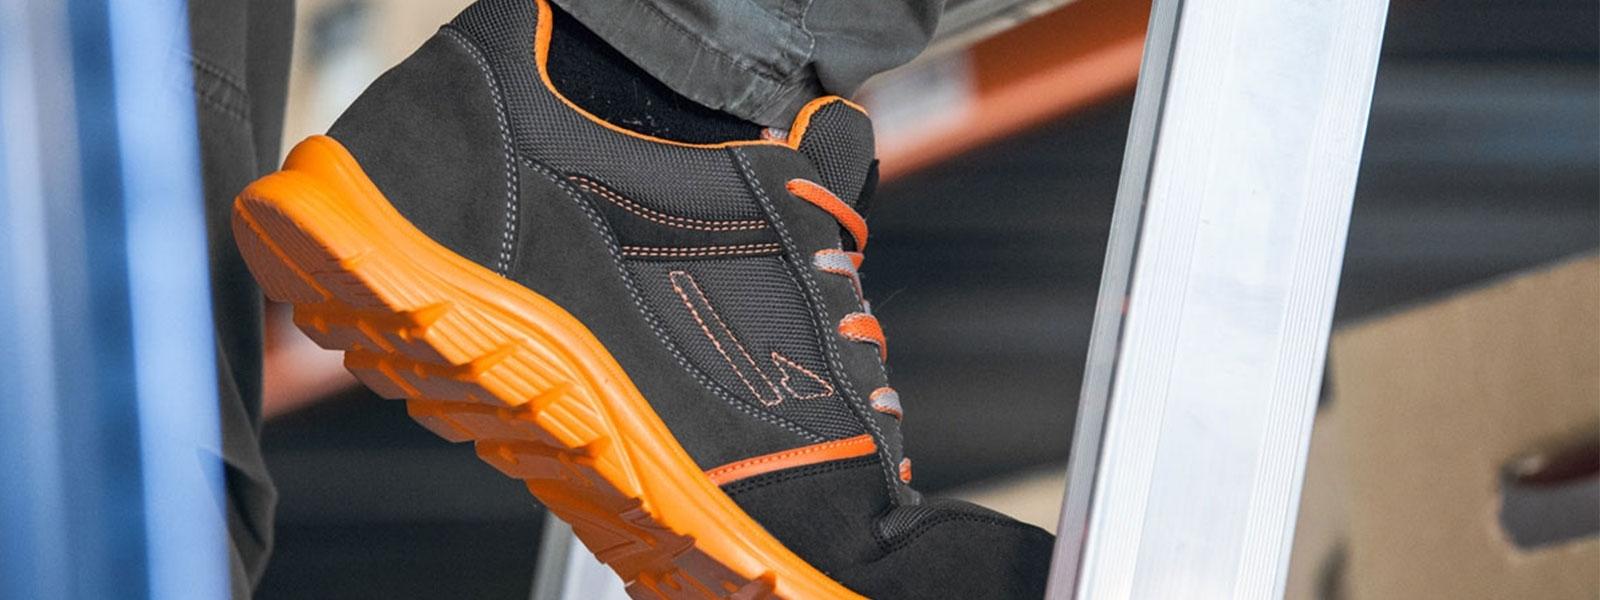 Garsport antinfortunistica - linea scarpa antinfortunistica Cyclone